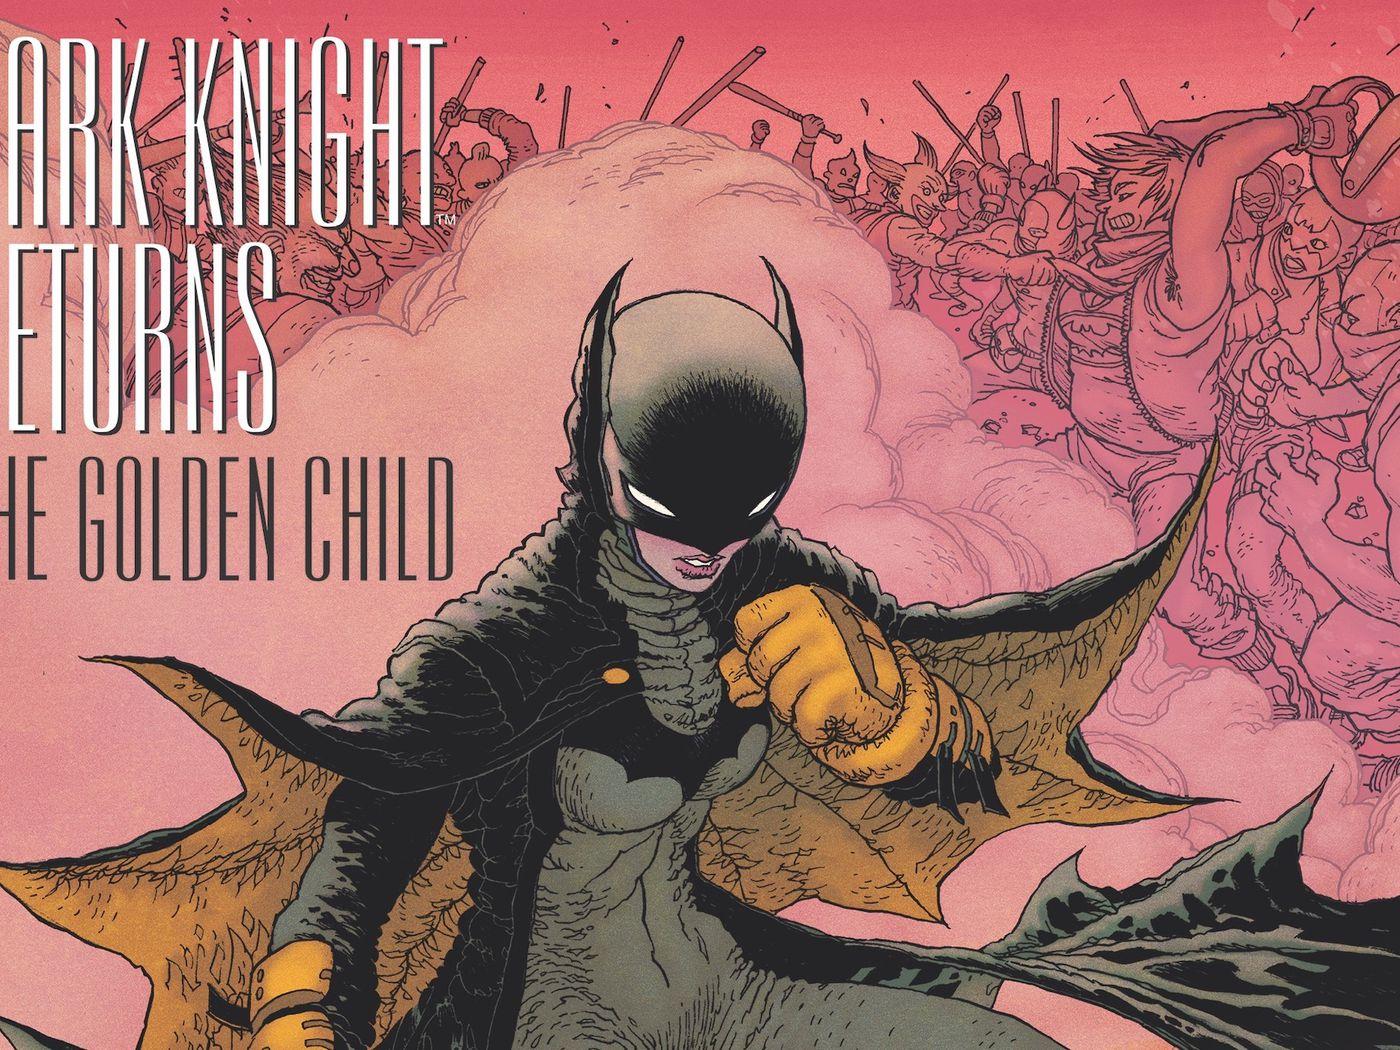 The Dark Knight Returns In Frank Miller S New Batman Story Golden Child Polygon